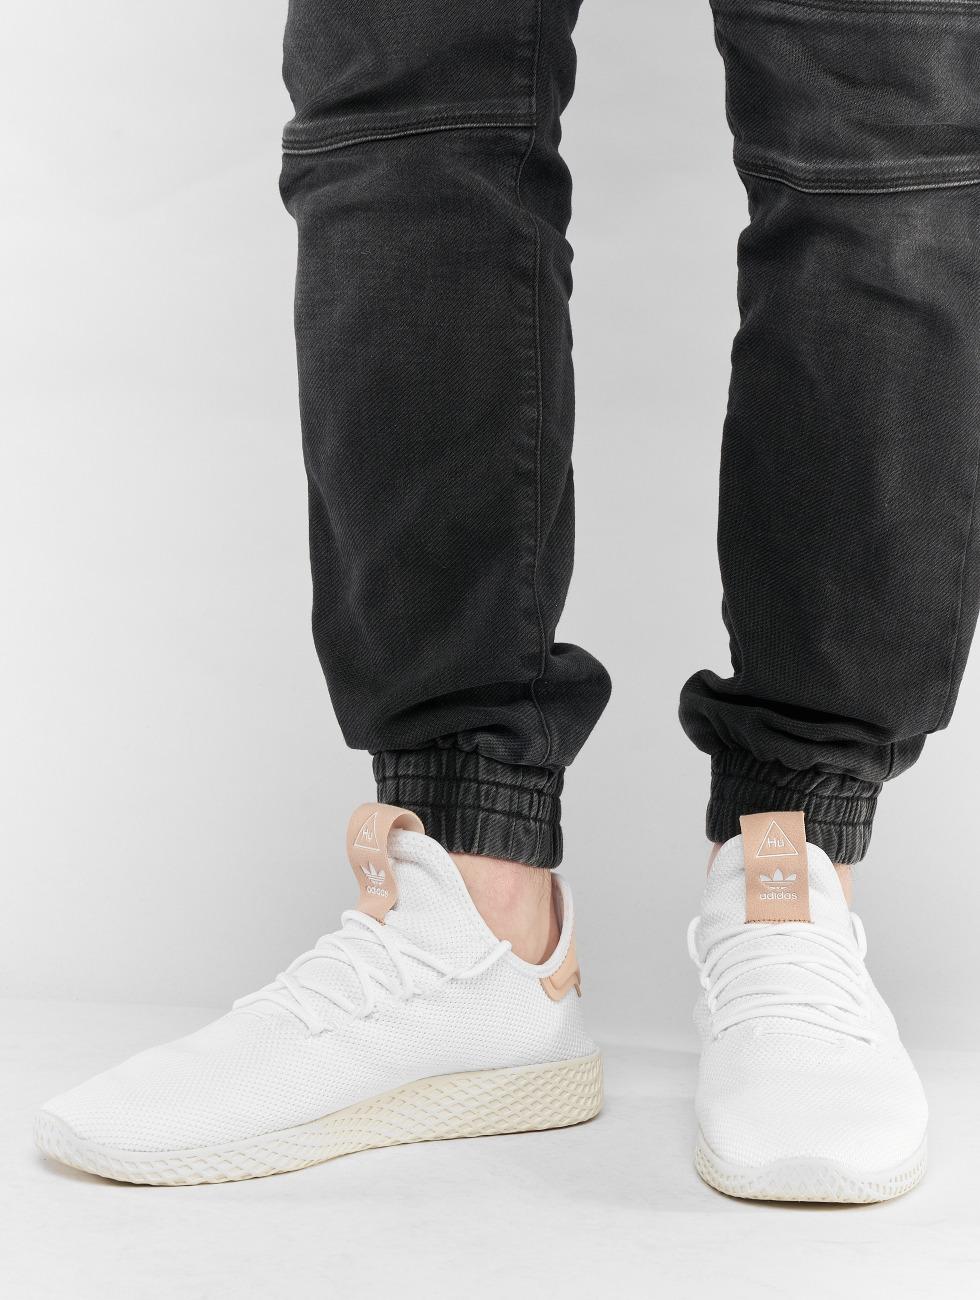 Adidas Originals Scarpa / Sneaker Pw Tennis Hu In Bianco 437 318 RfqjWyzLi